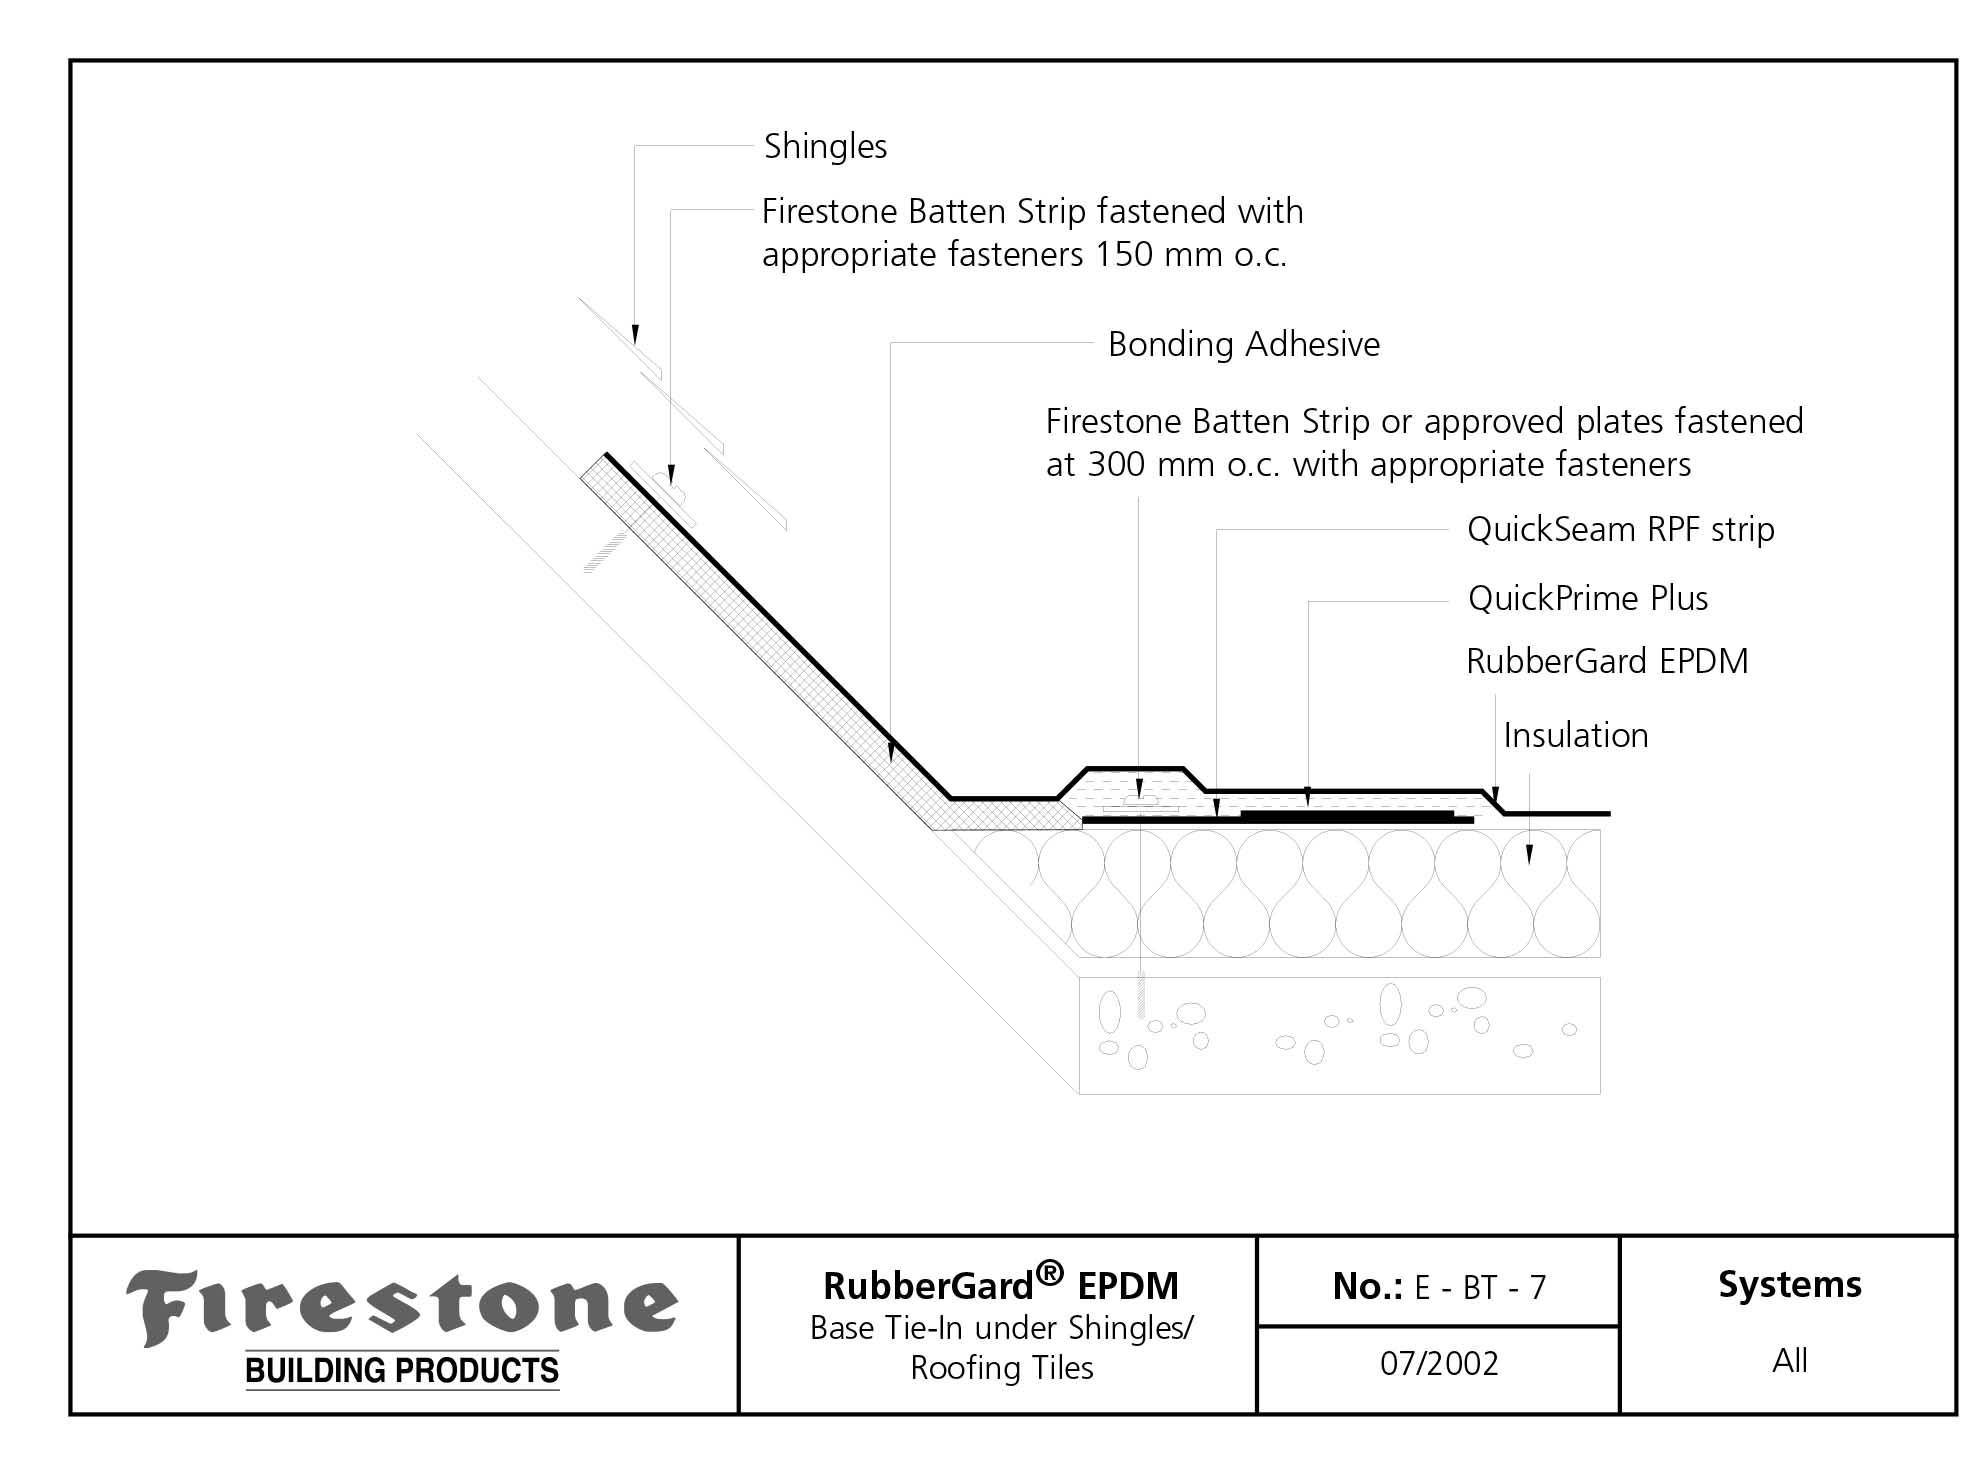 firestone epdm technical manual